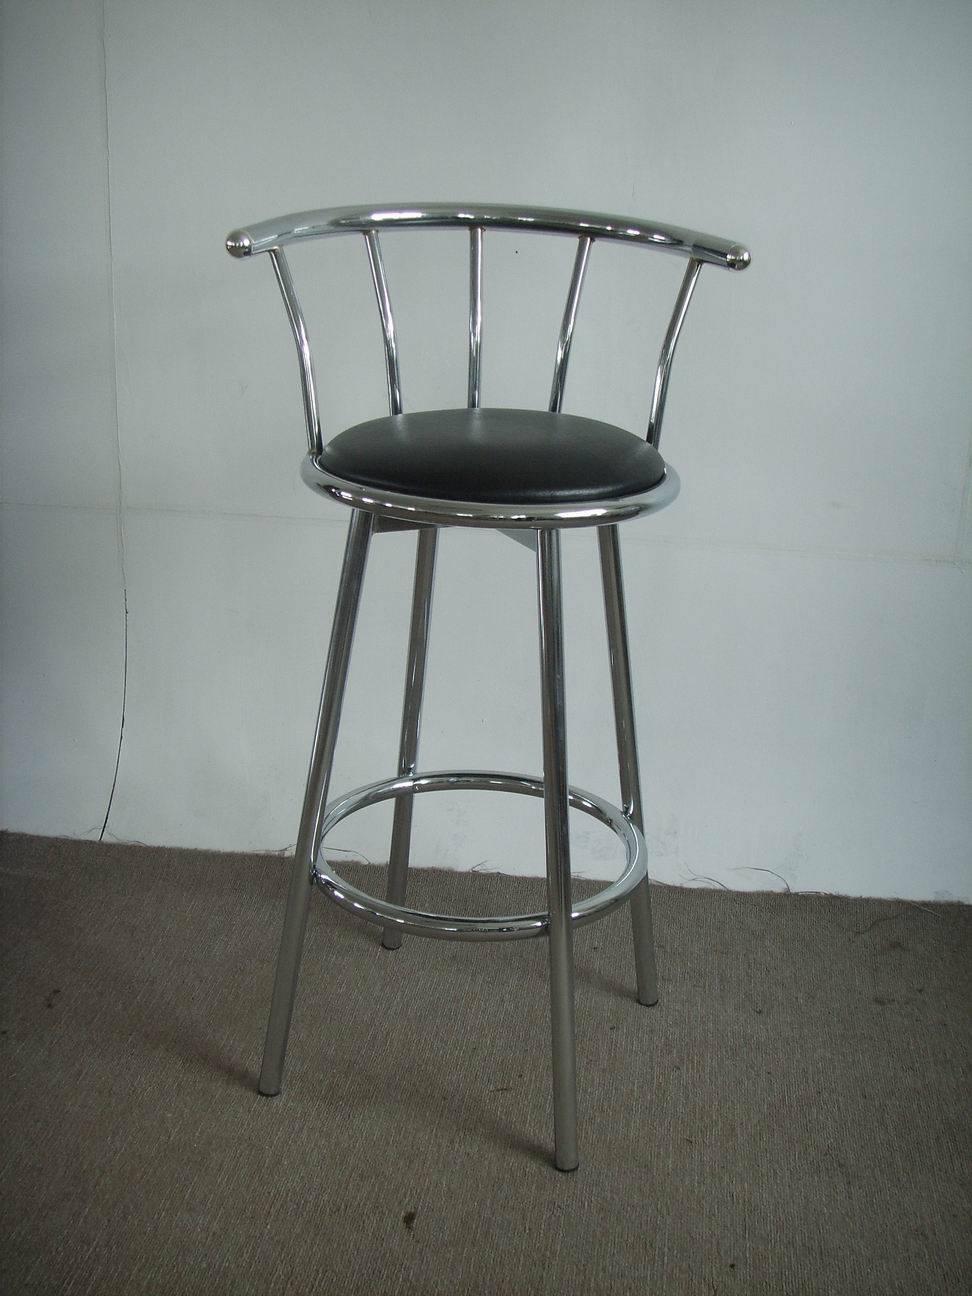 Bar stool7027